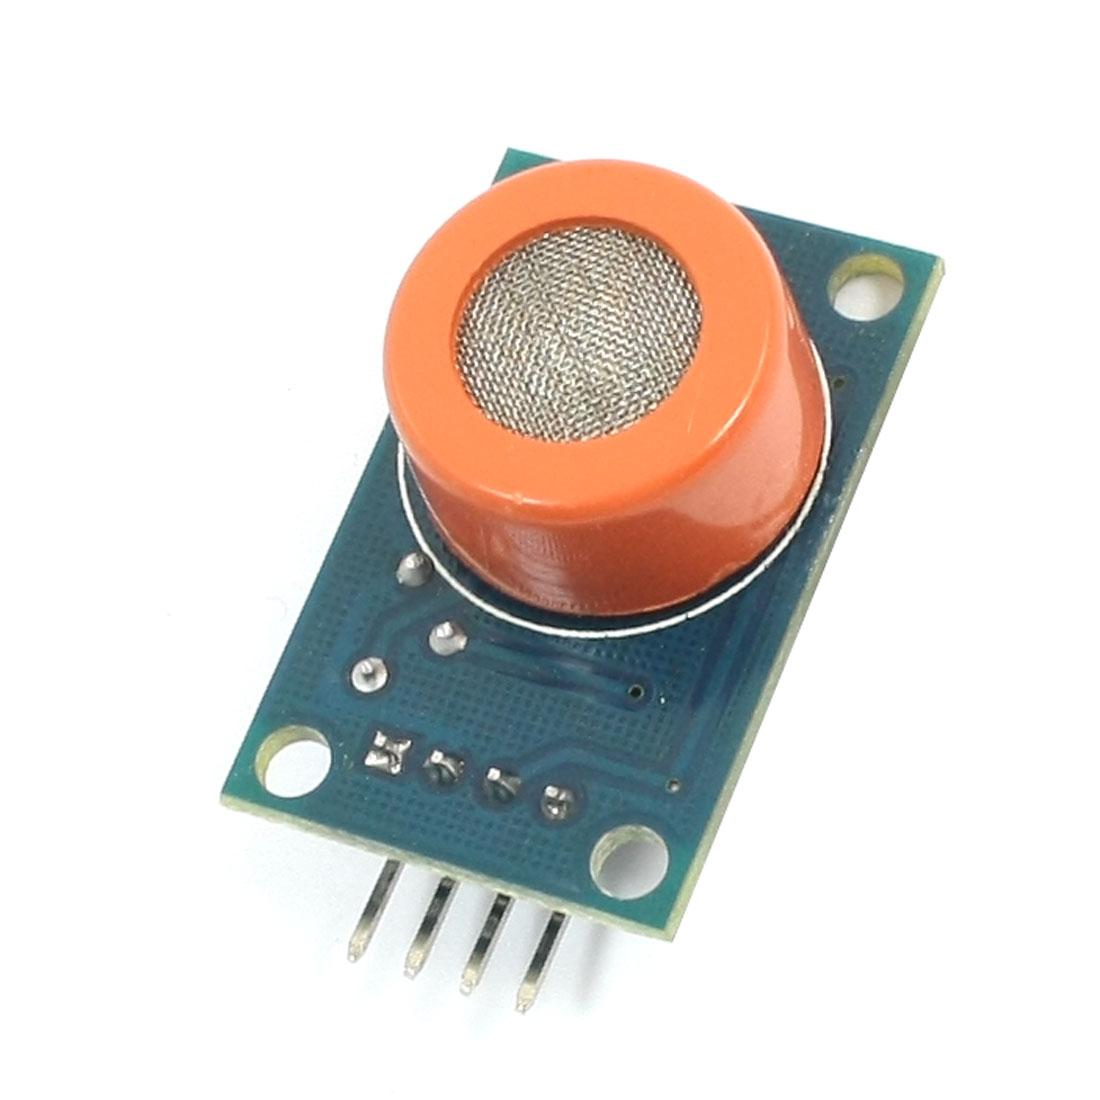 DIY Alcohol Ethanol Gas Detection Sensor Alarm Module MQ-3 for MCU